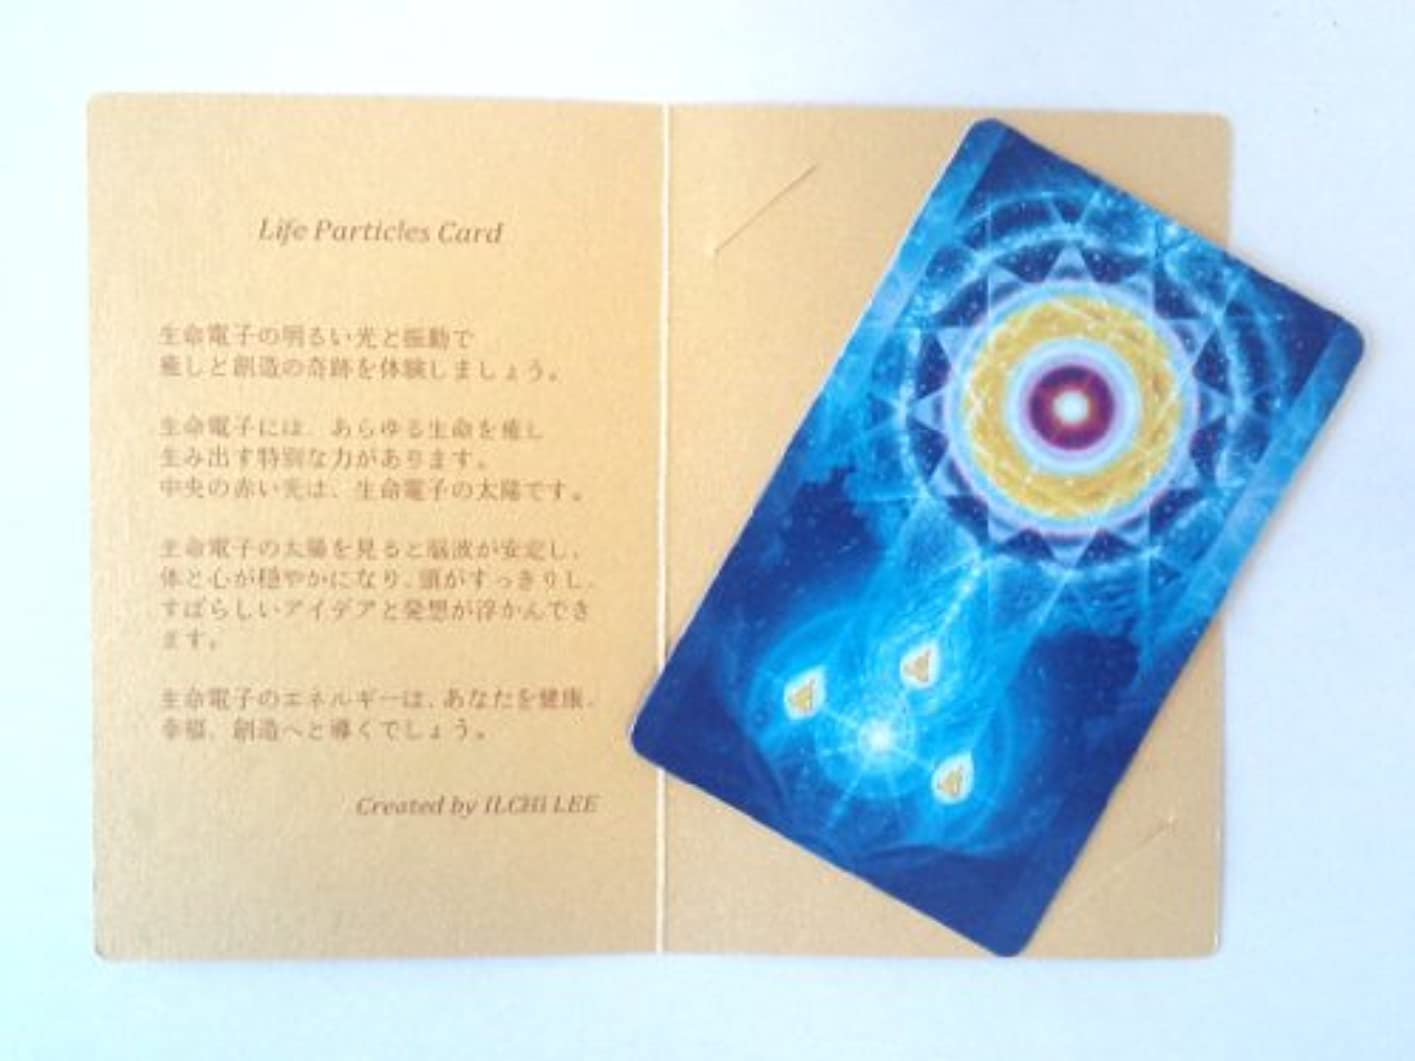 小切手額忍耐生命電子カード